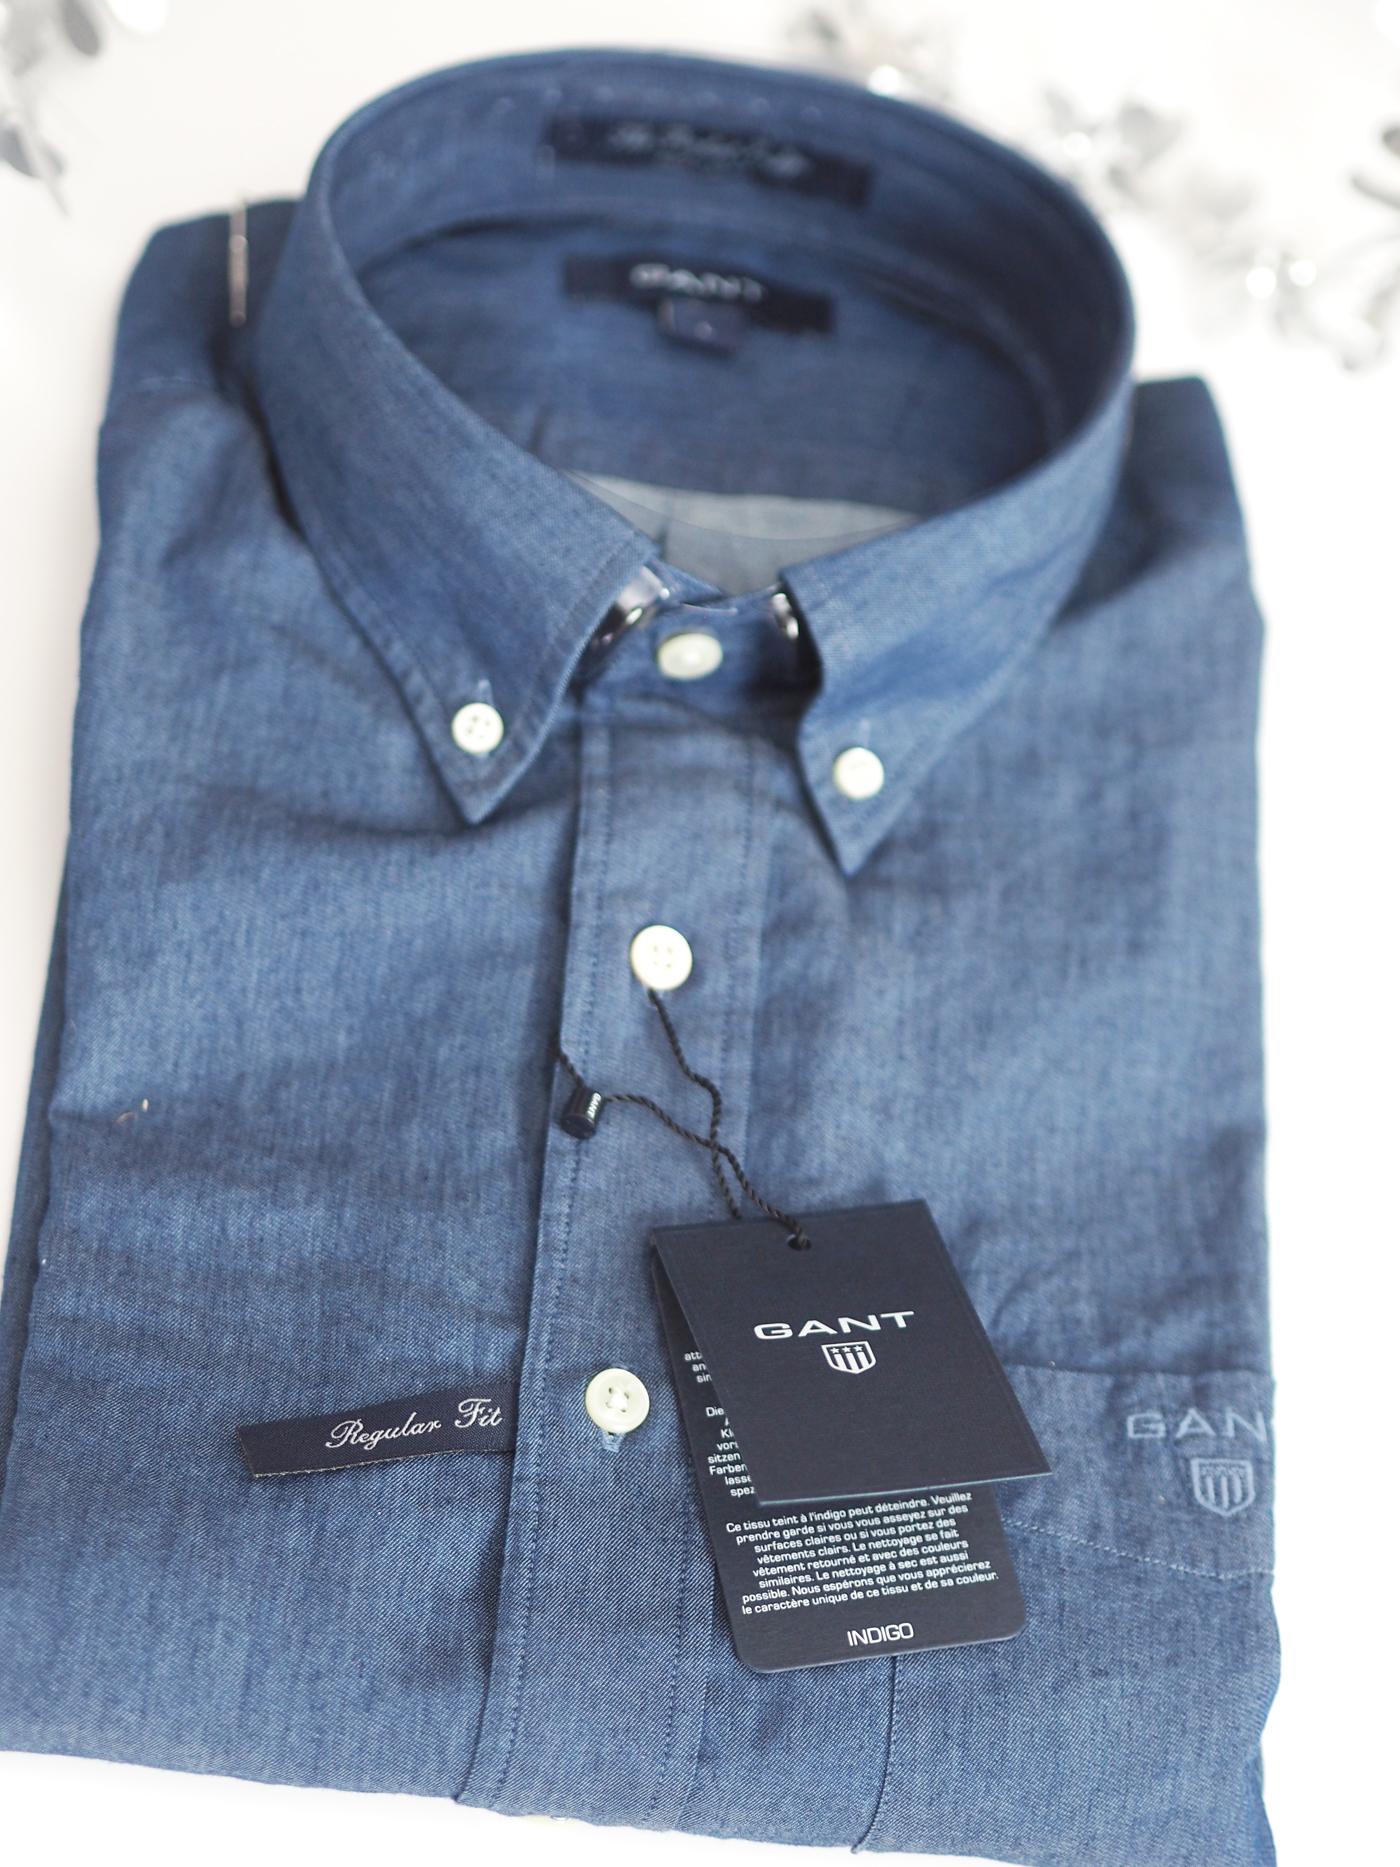 gant indigo shirt